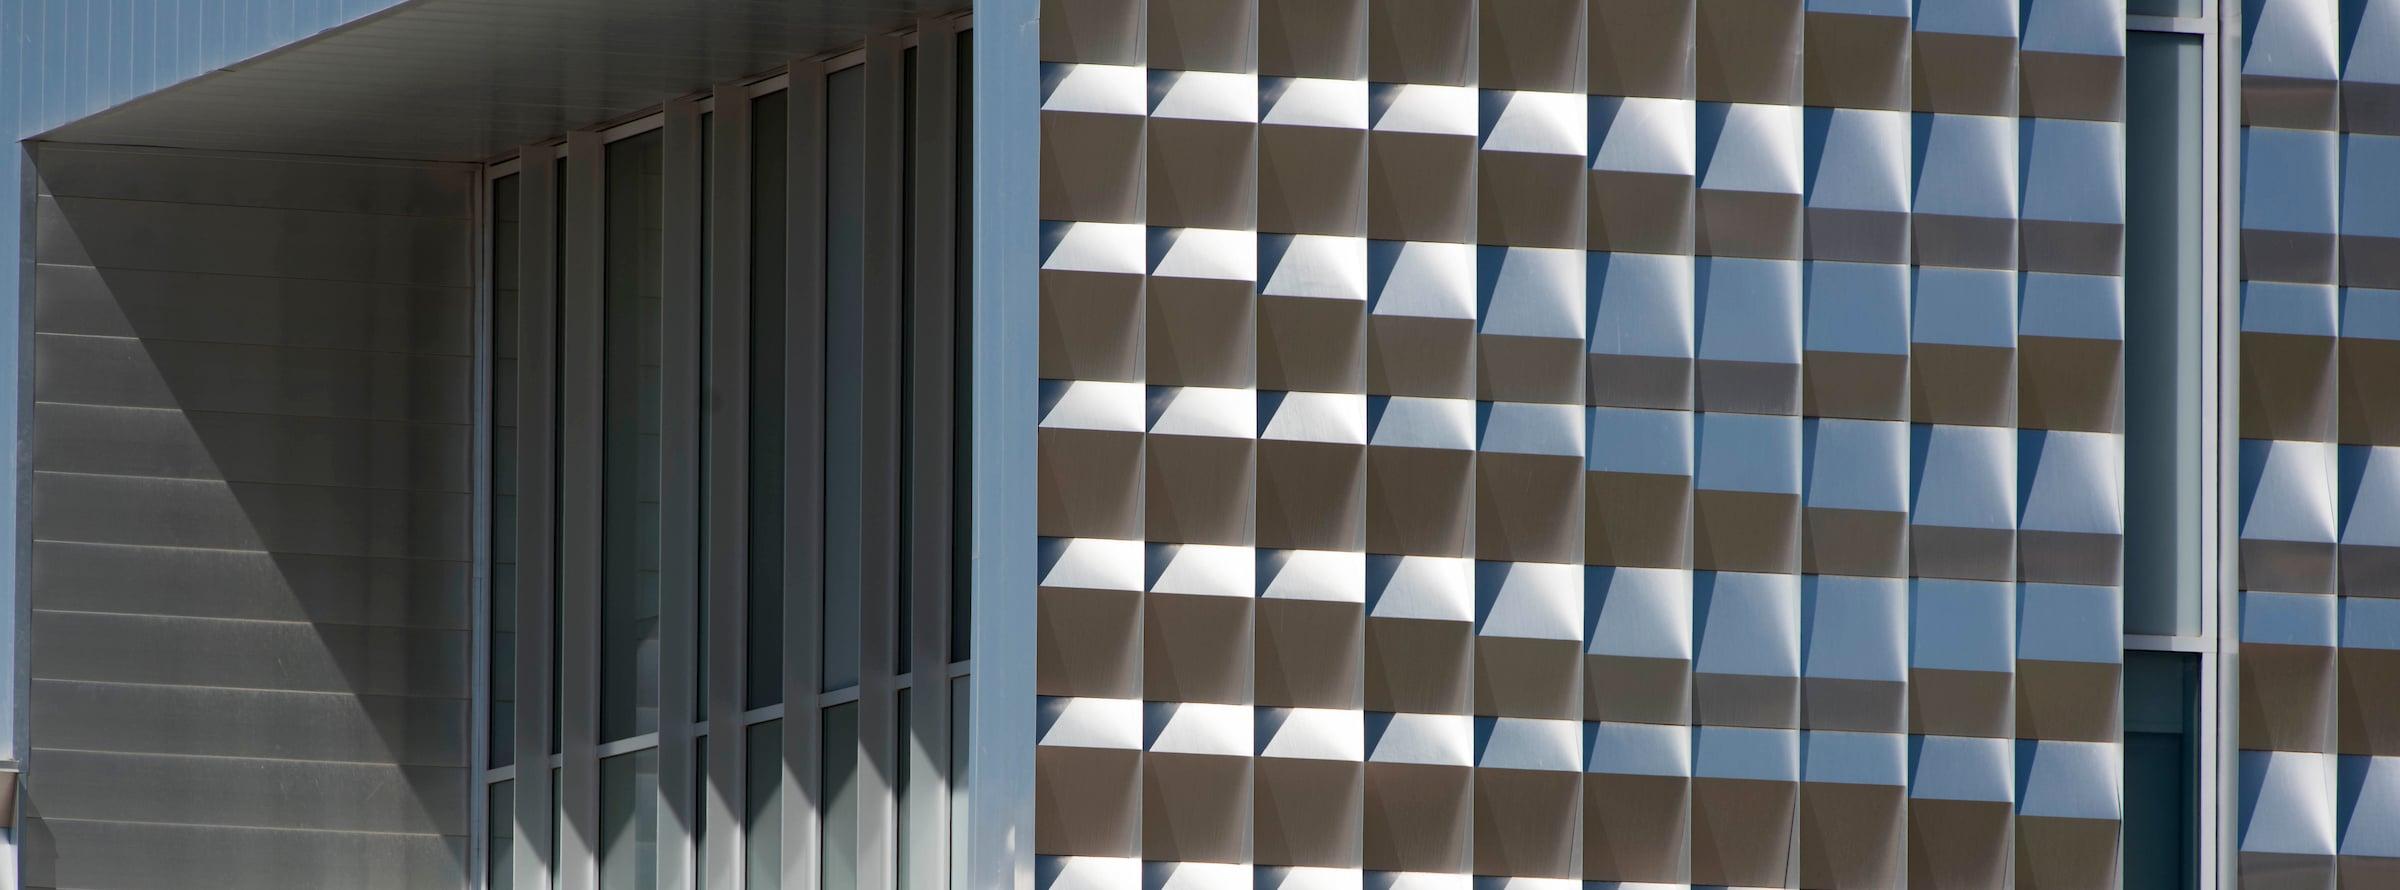 Stupendous Justice Studies Bachelor Nau Yuma Download Free Architecture Designs Licukmadebymaigaardcom